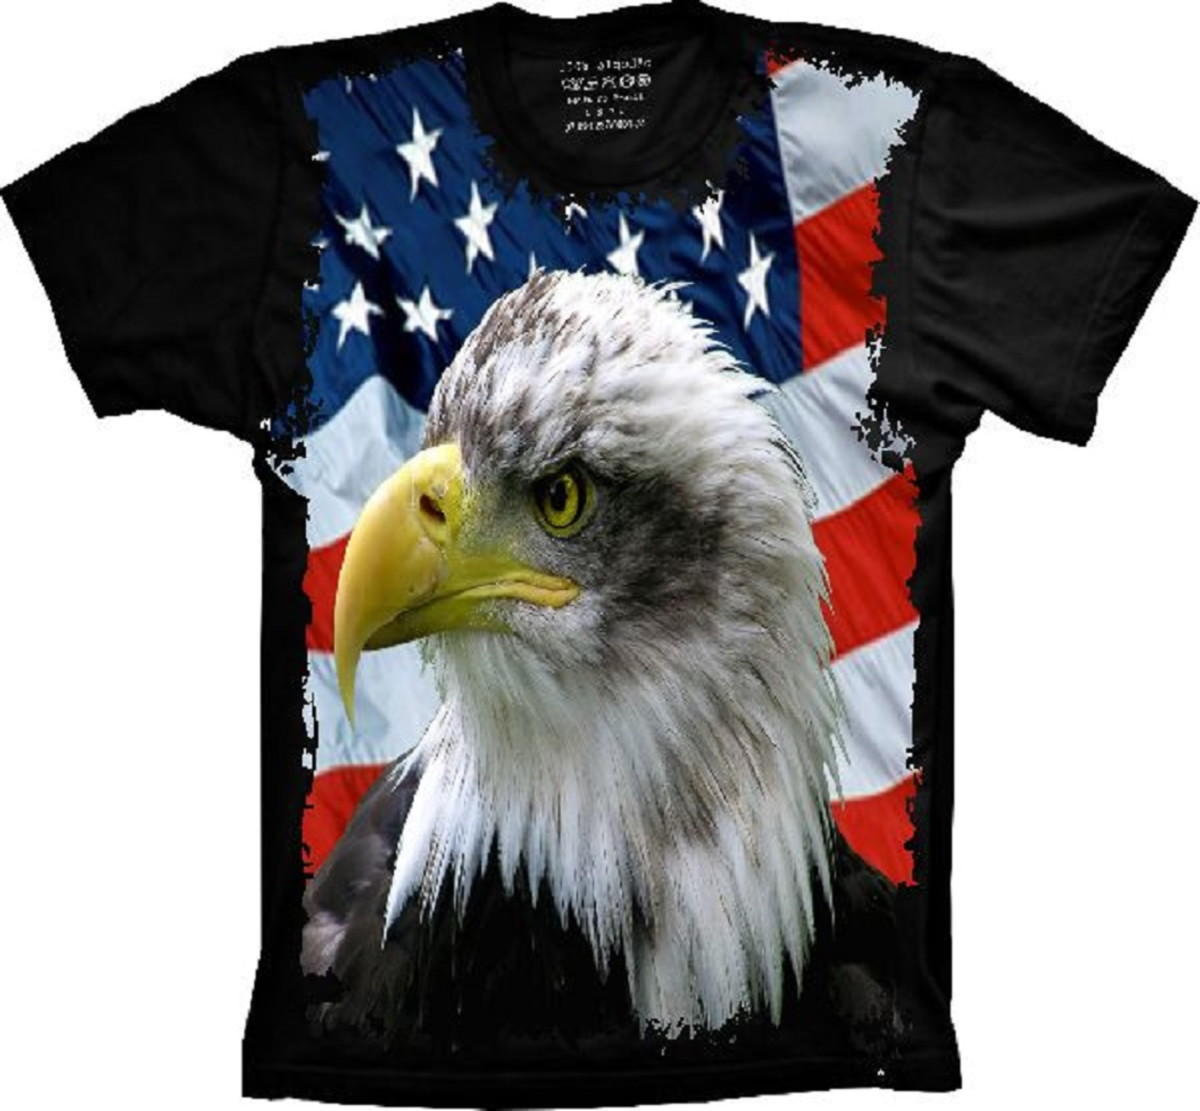 Camiseta Bandeira Dos Estados Unidos Águia no Elo7  42e9659a4b2